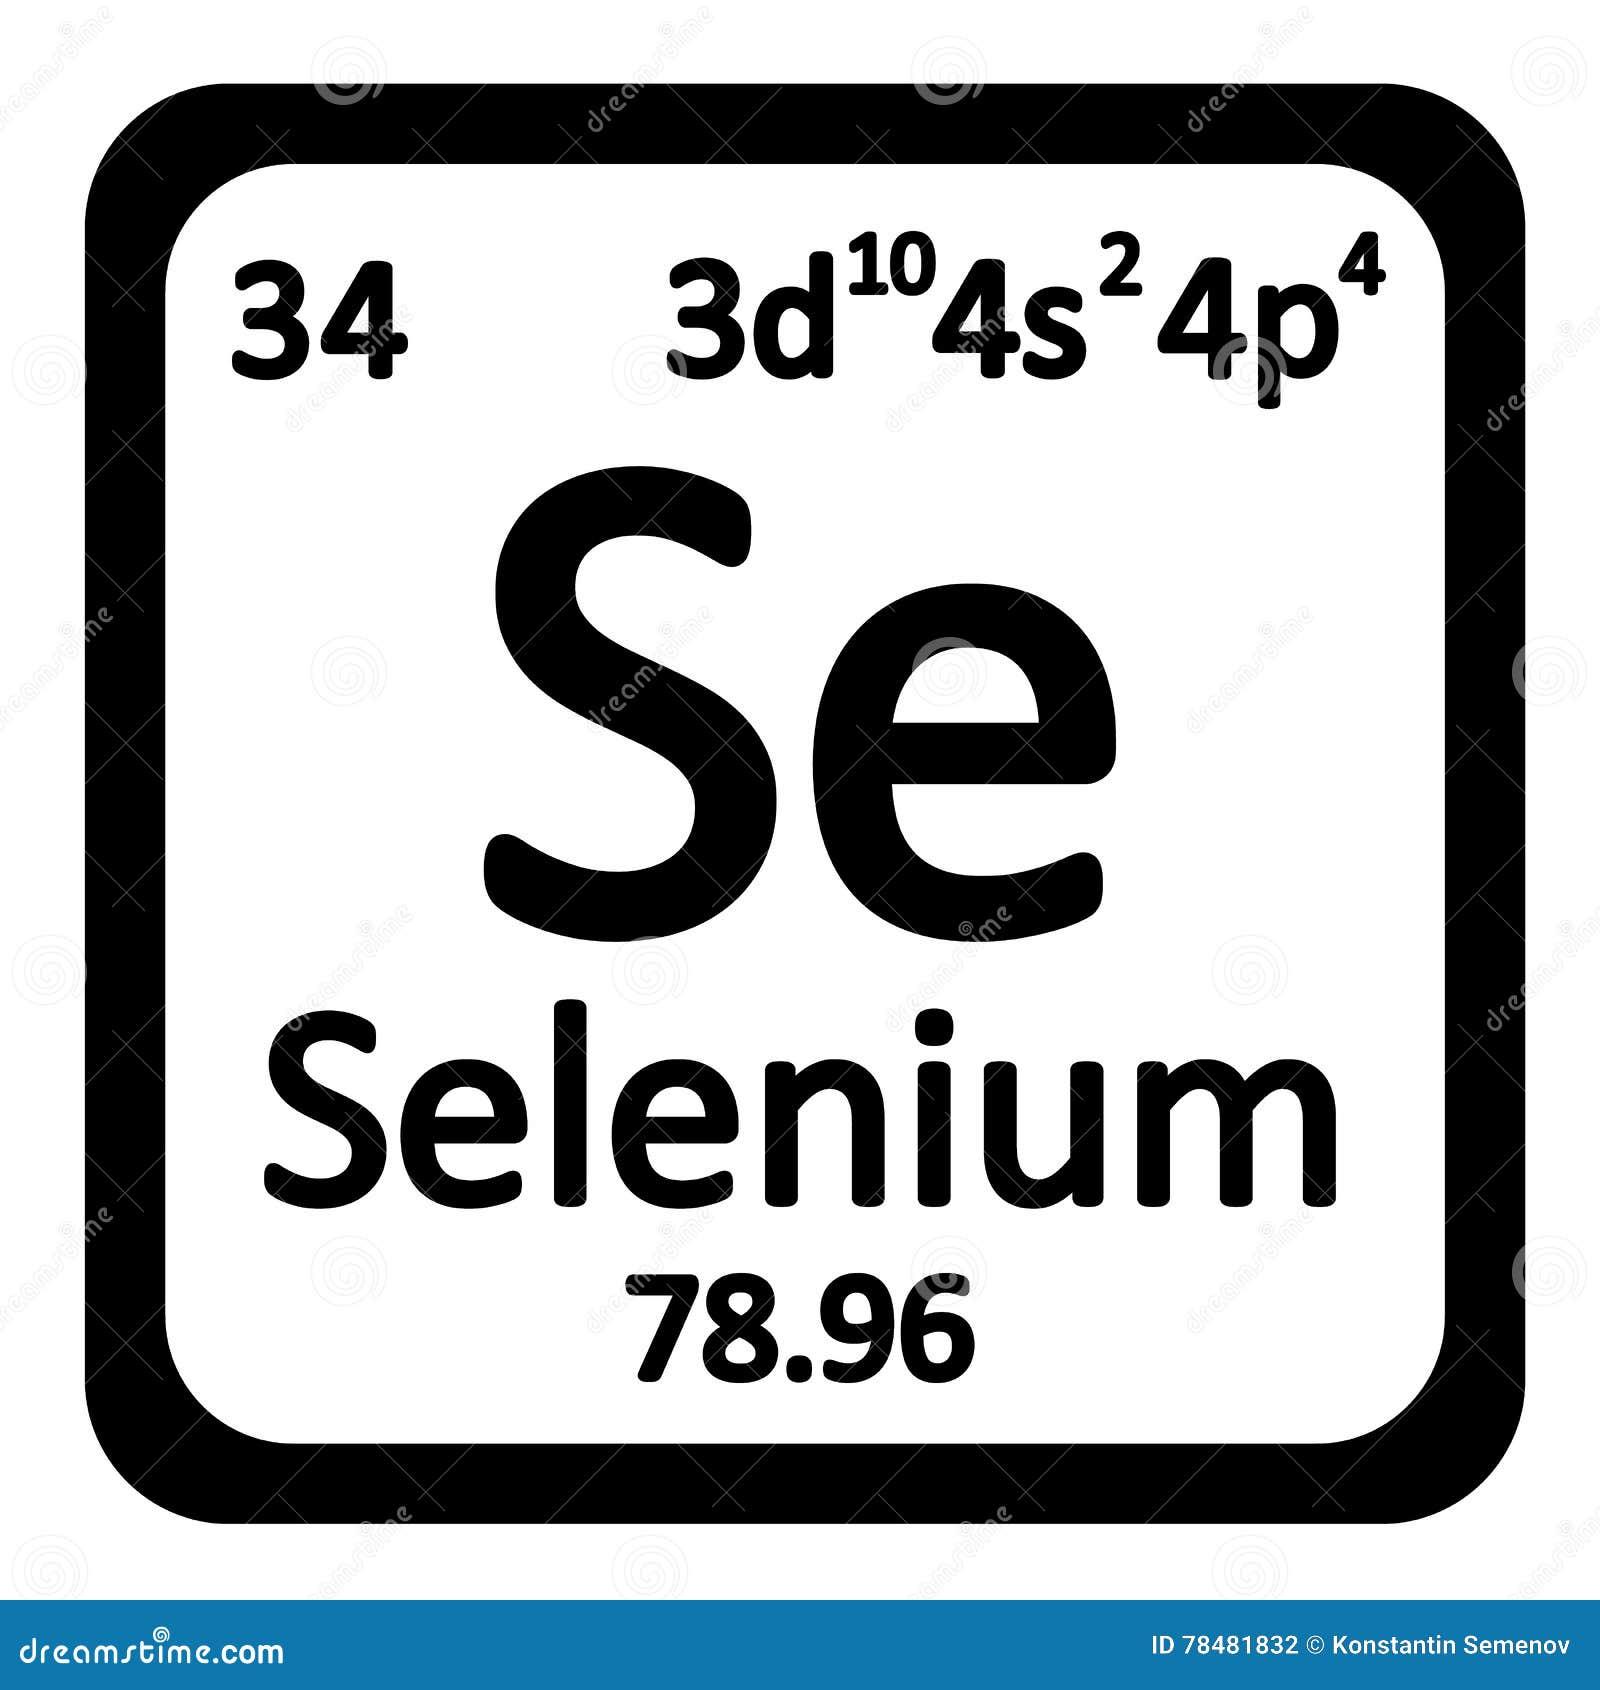 Periodic table element selenium icon stock illustration periodic table element selenium icon buycottarizona